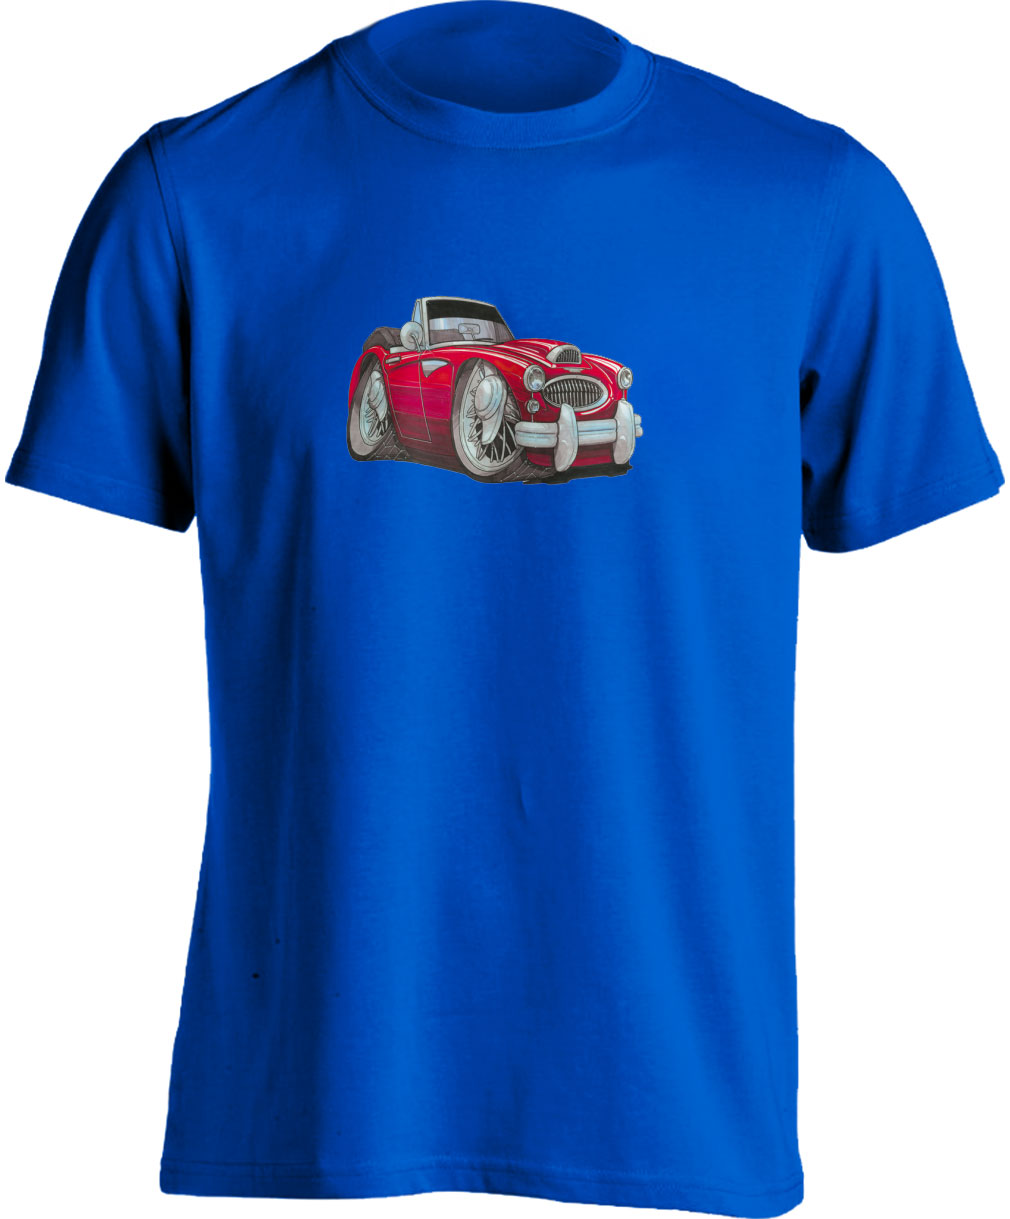 Koolart Austin Healey 3000 Red0721 Child's T Shirt